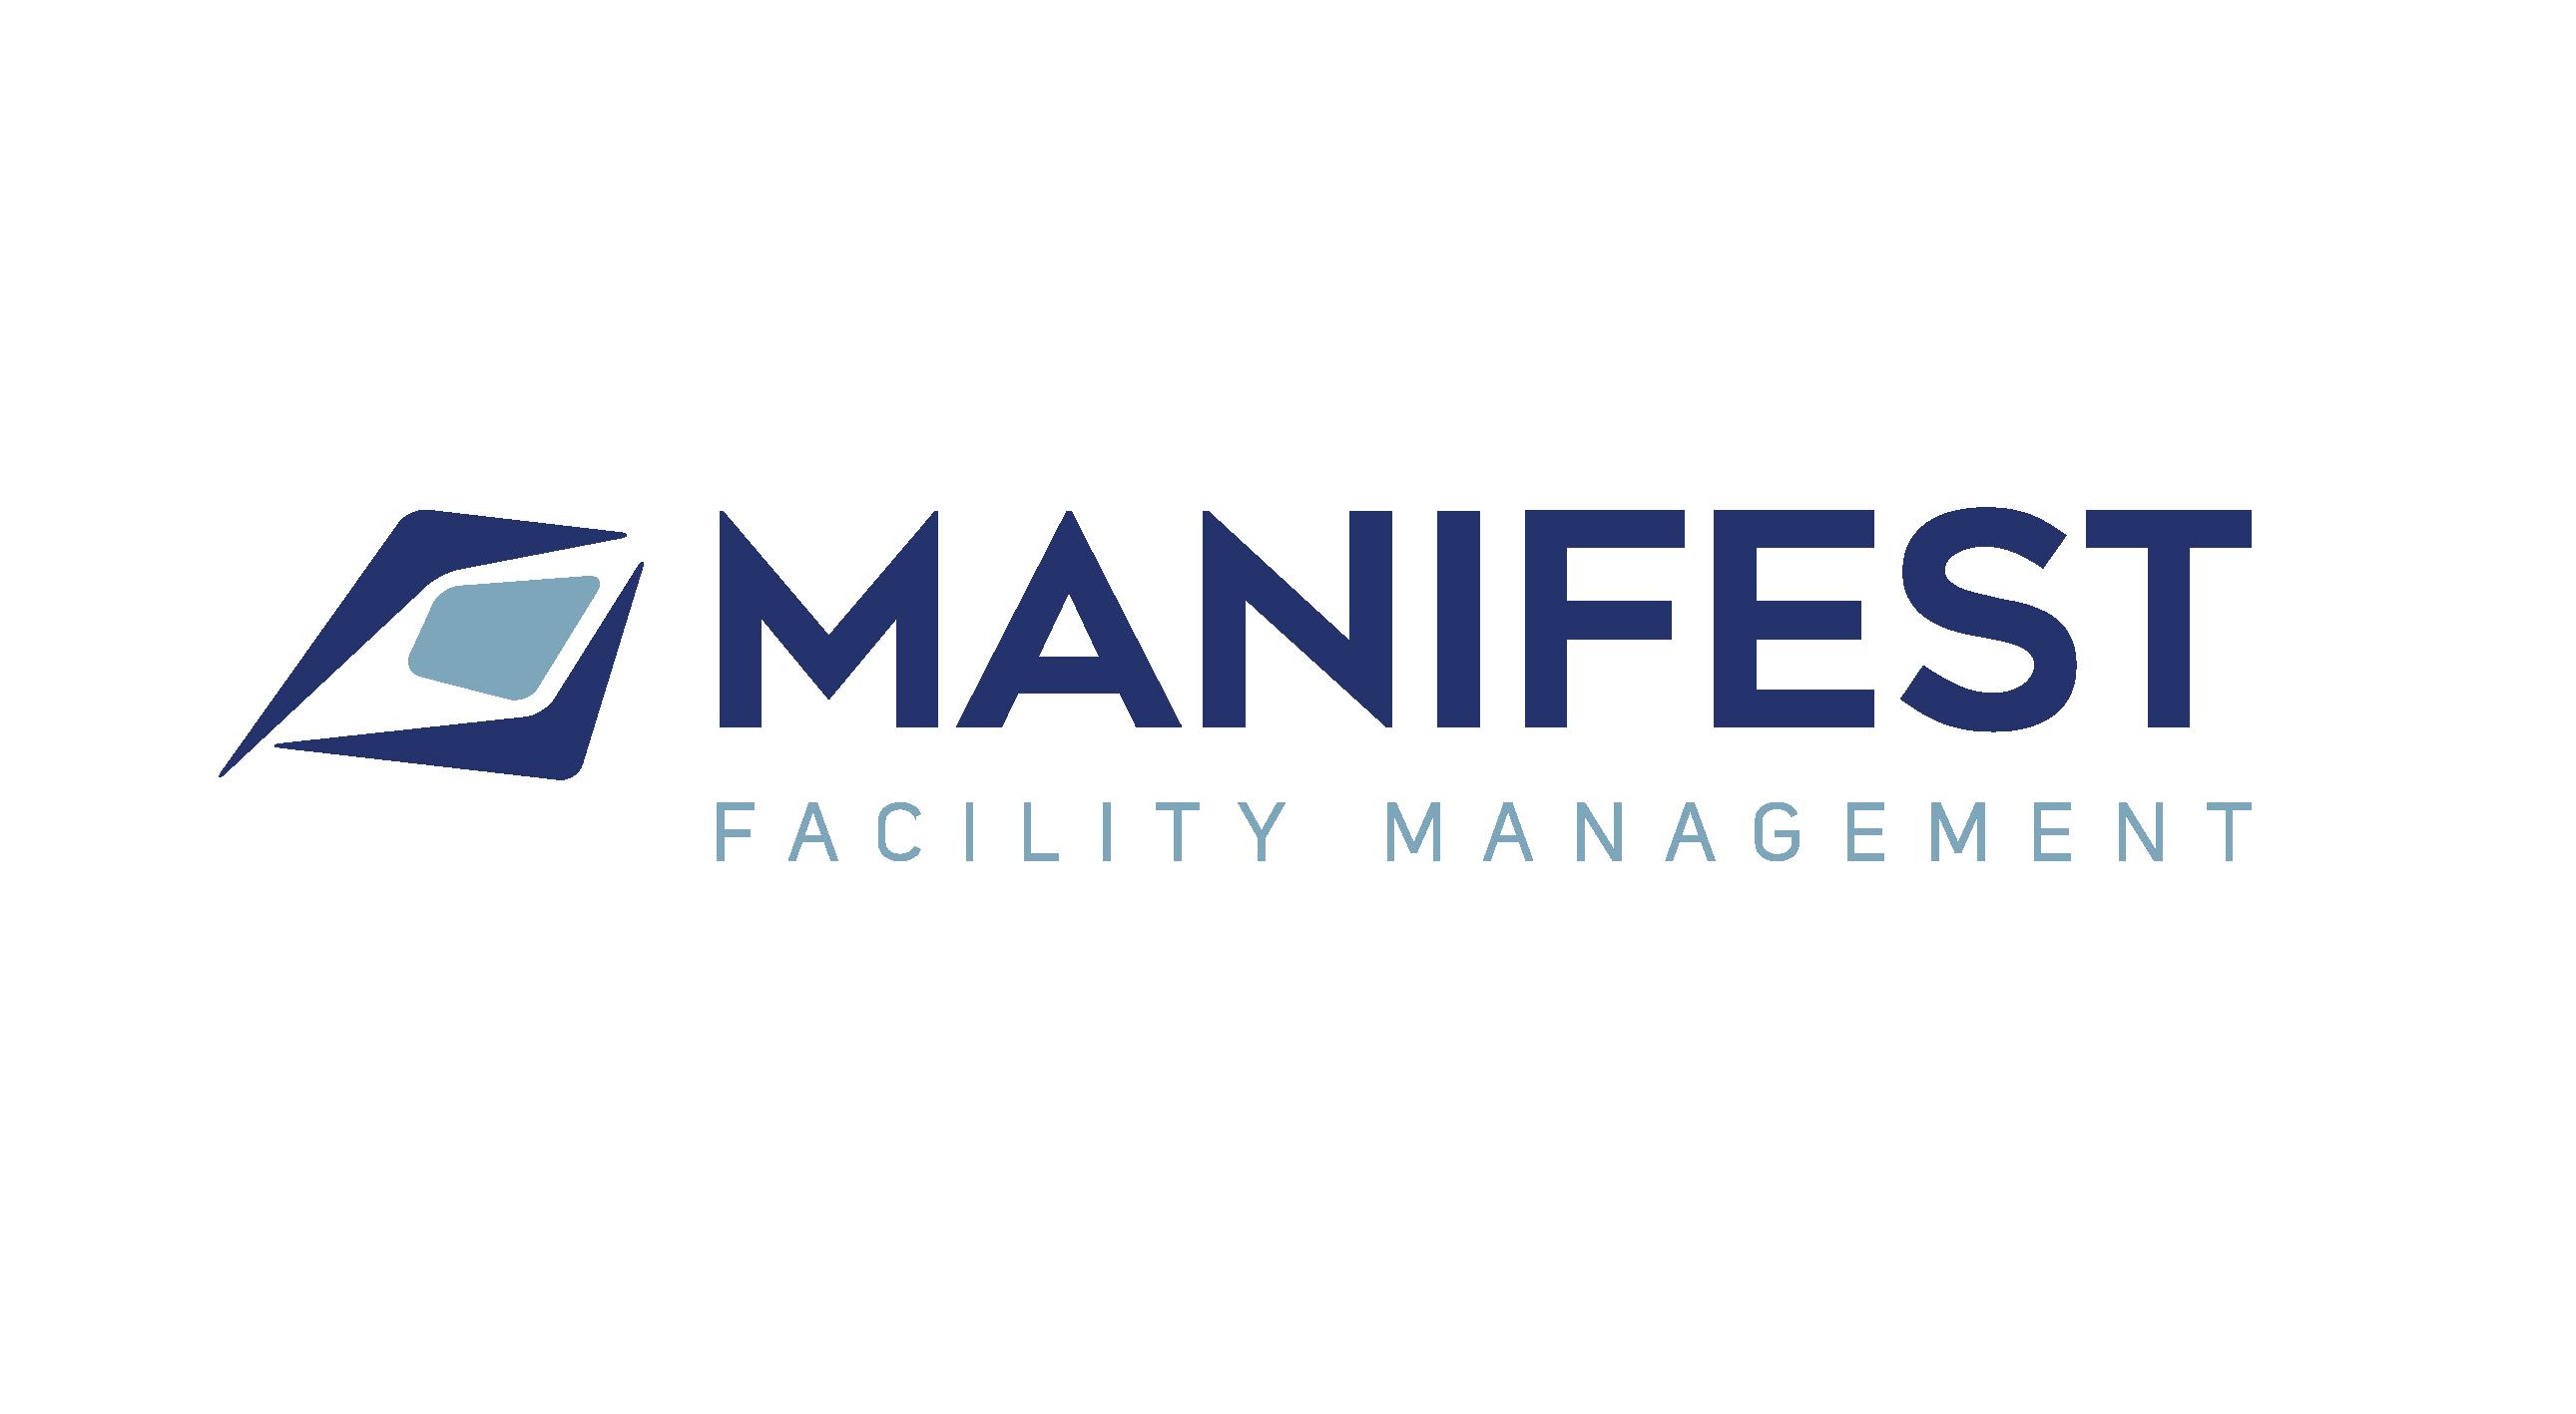 MANIFEST-FINALS_logos-01_FM.png